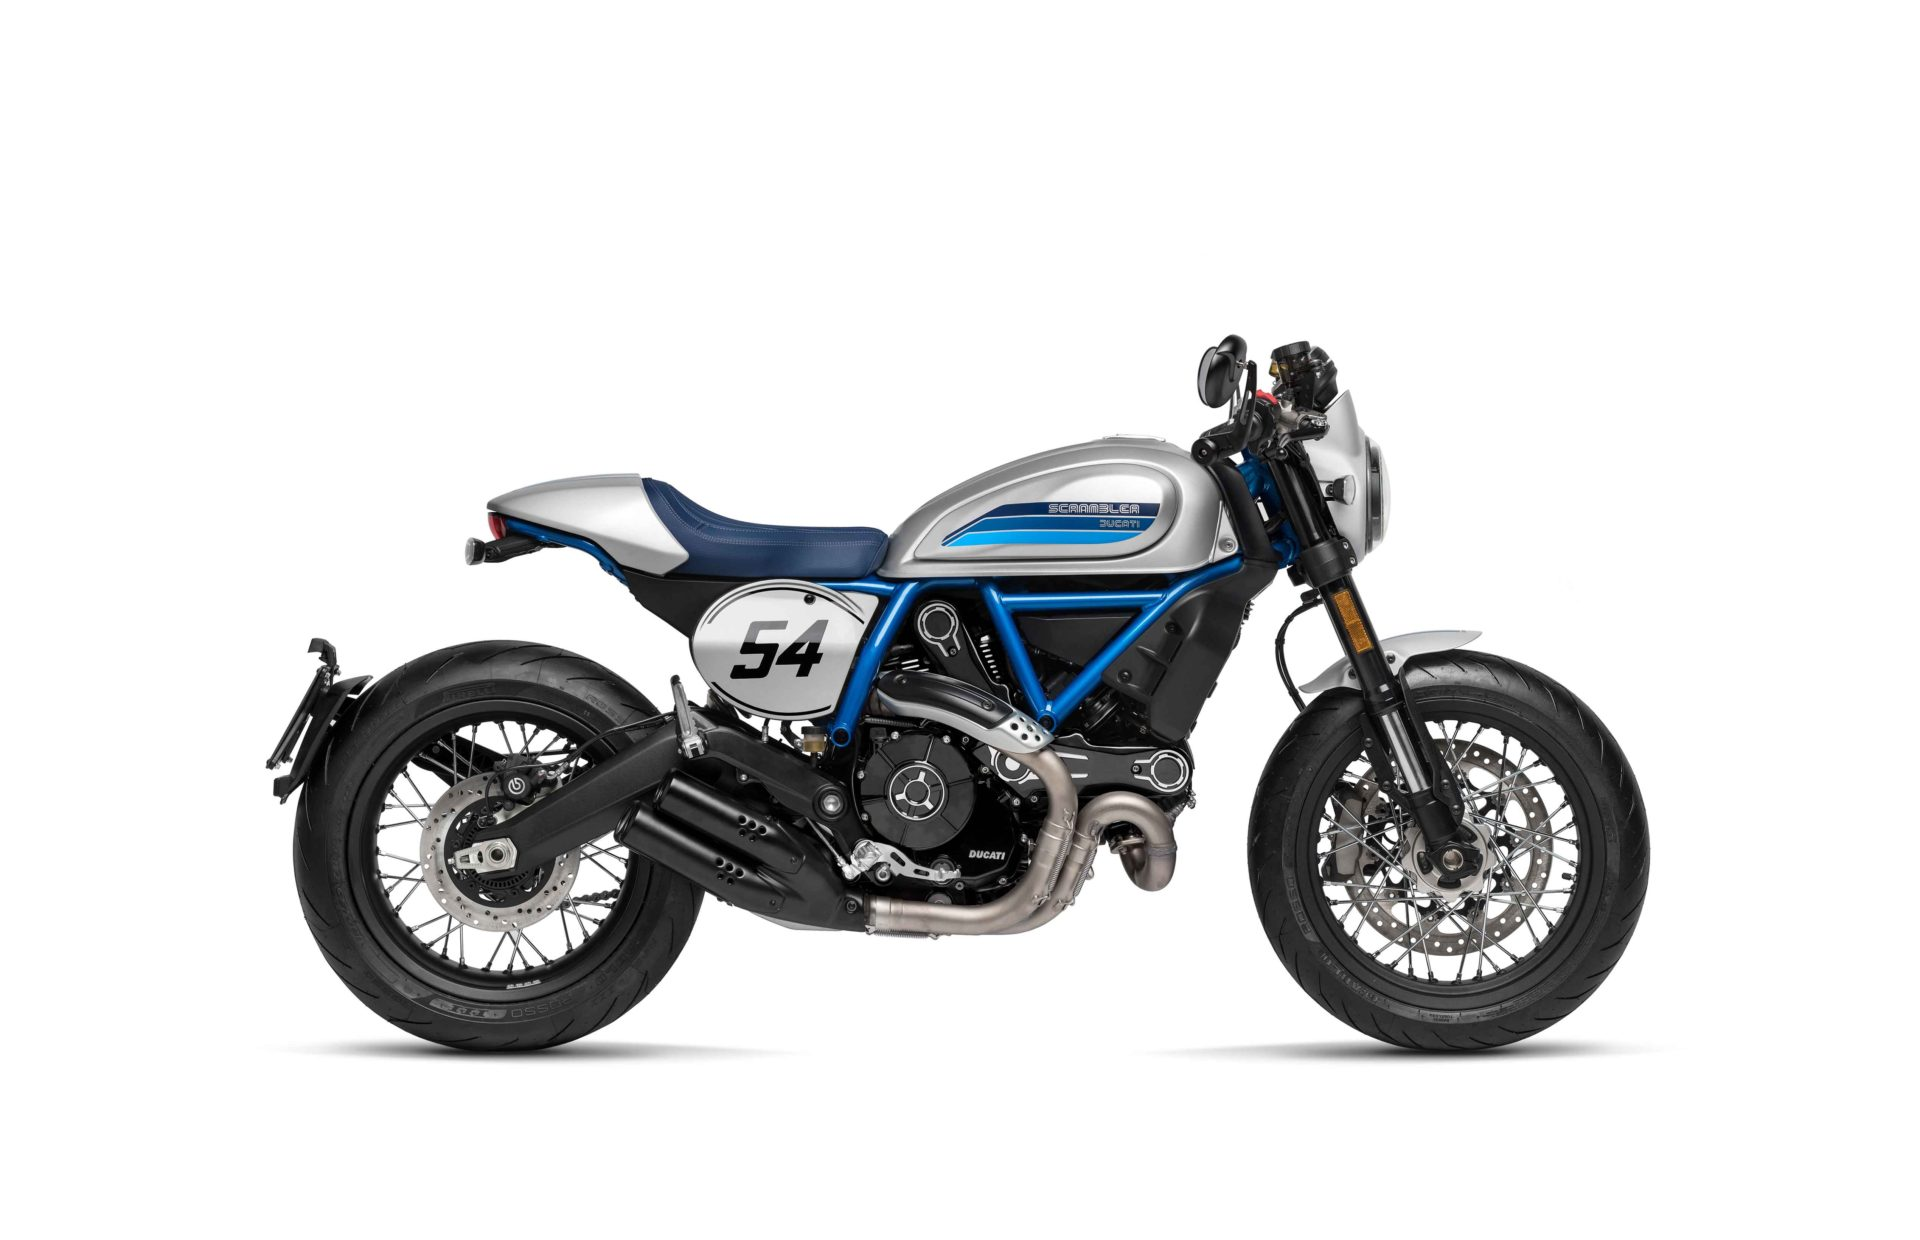 2021 Ducati Scrambler Cafe Racer